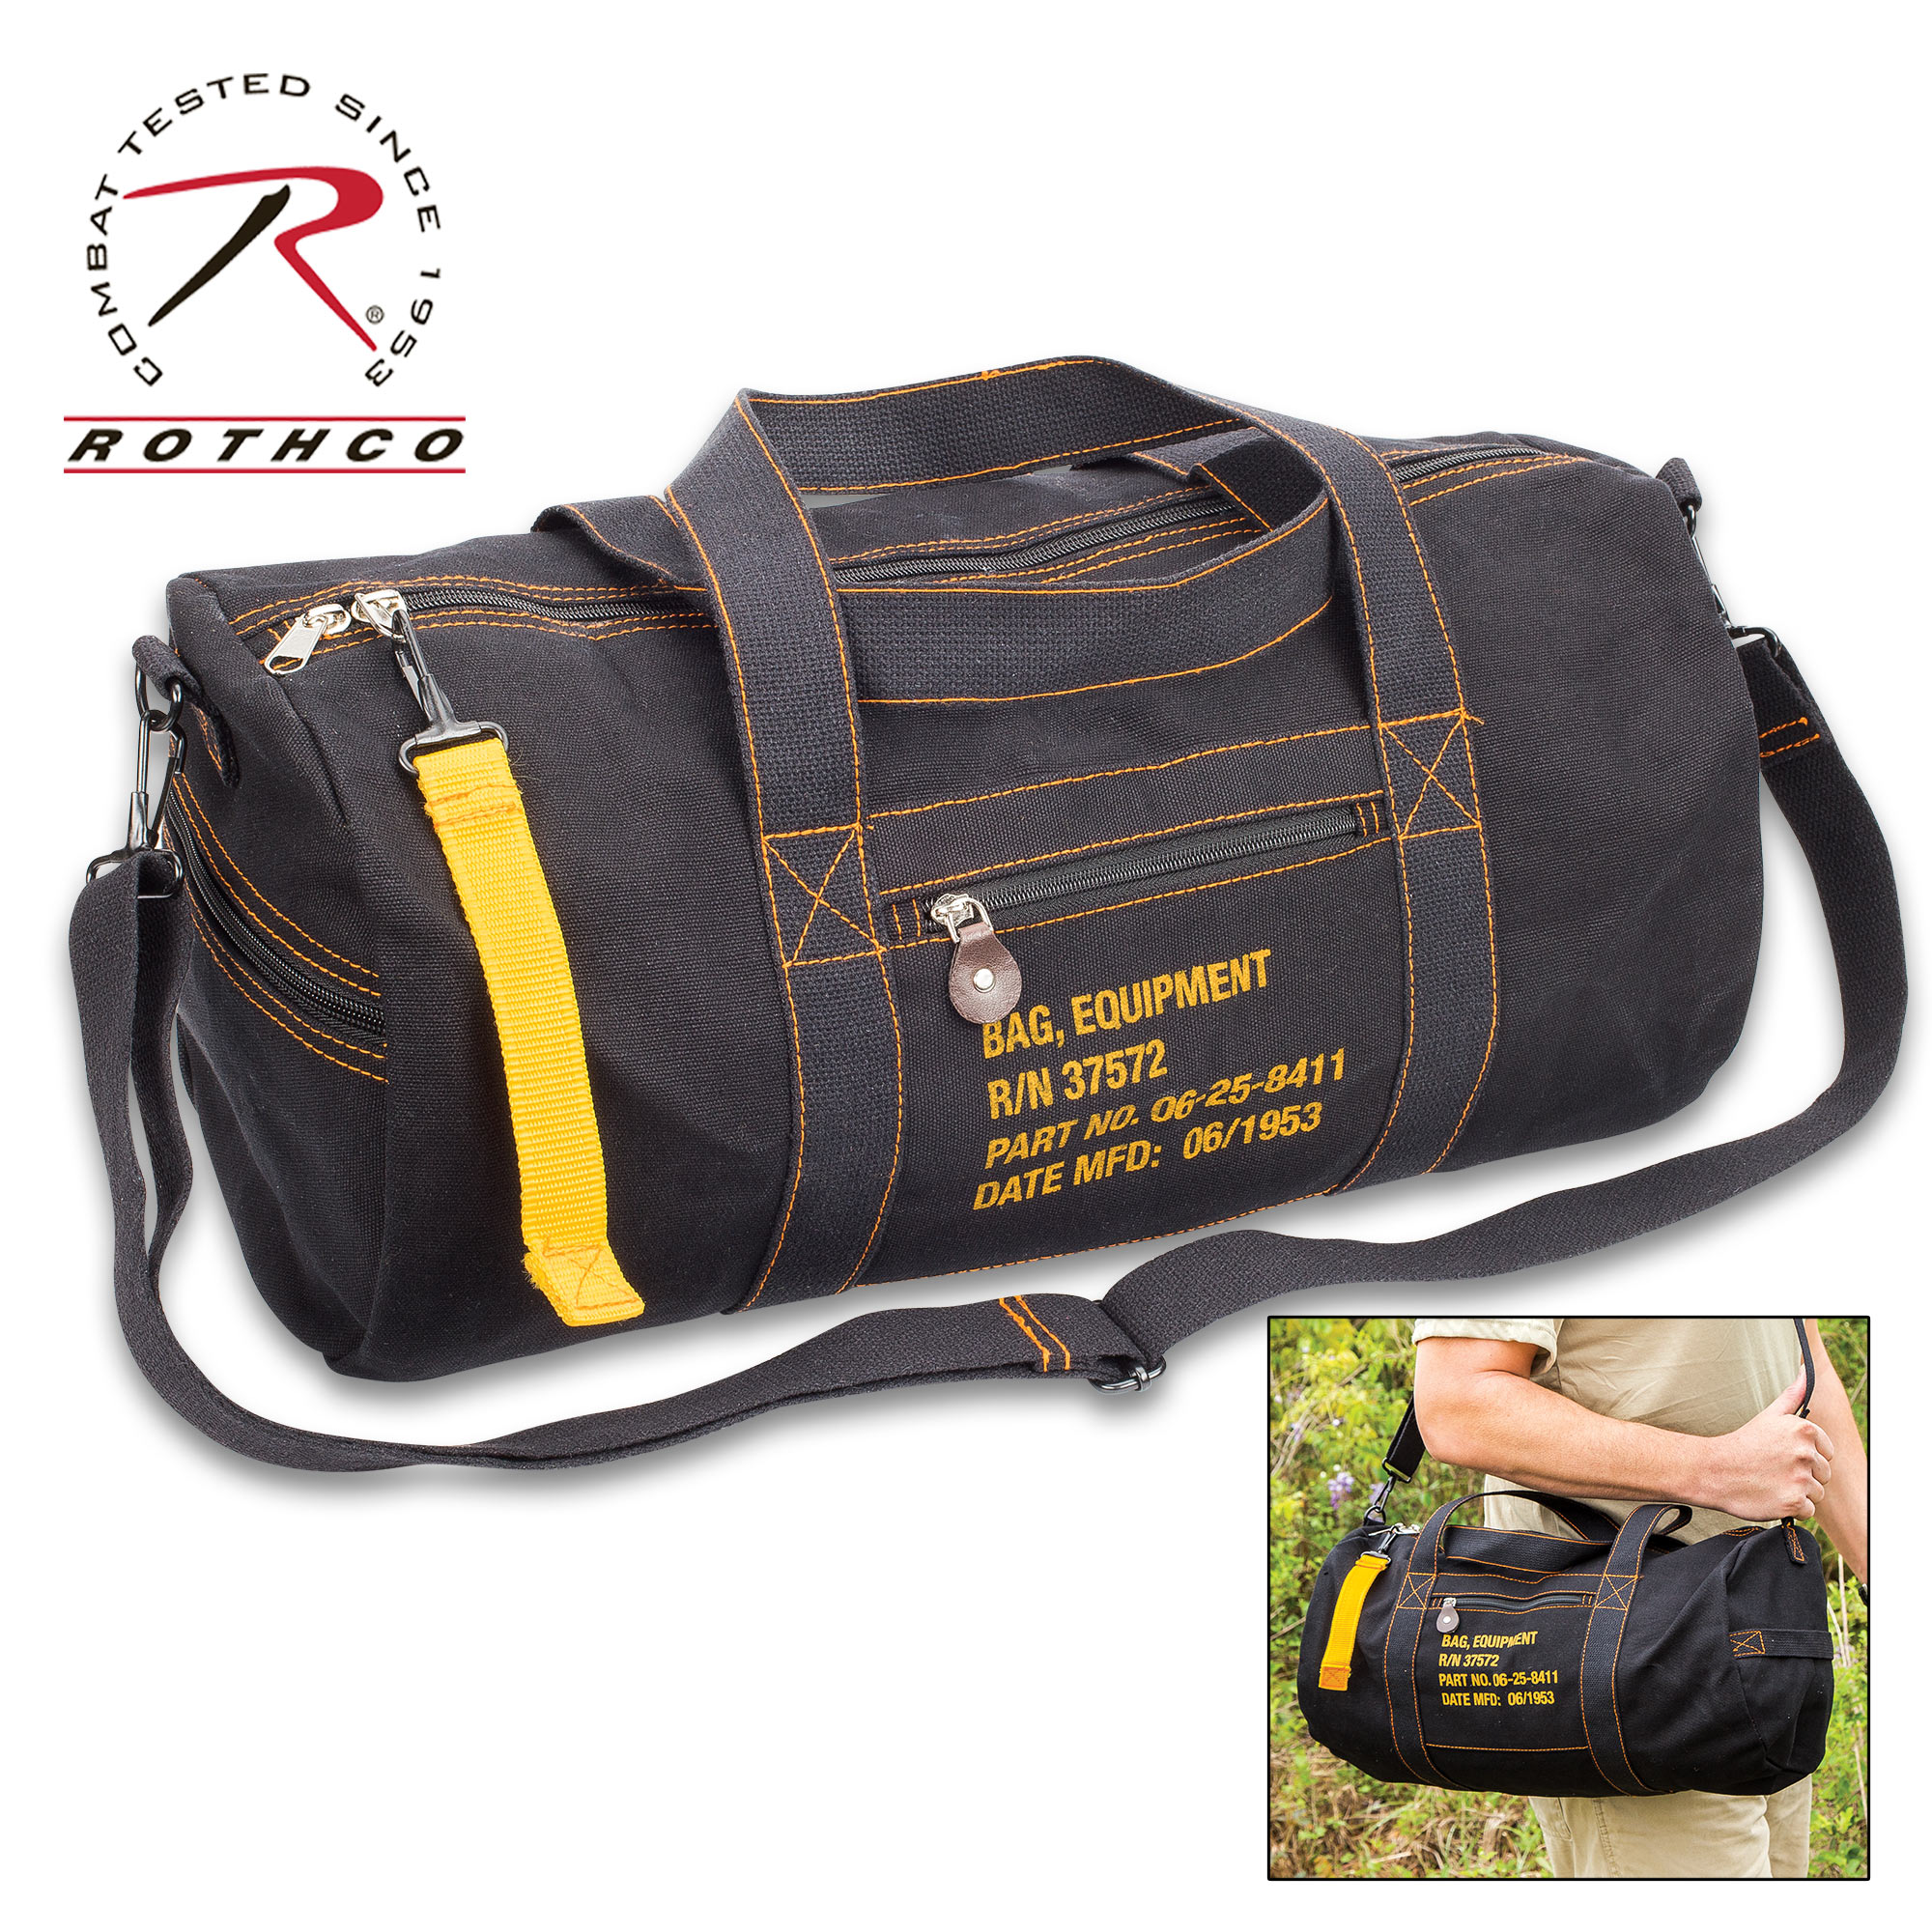 dcca3a429e7 Black Cotton Canvas Travel Equipment Carry Duffle Bag Flight Adjustable